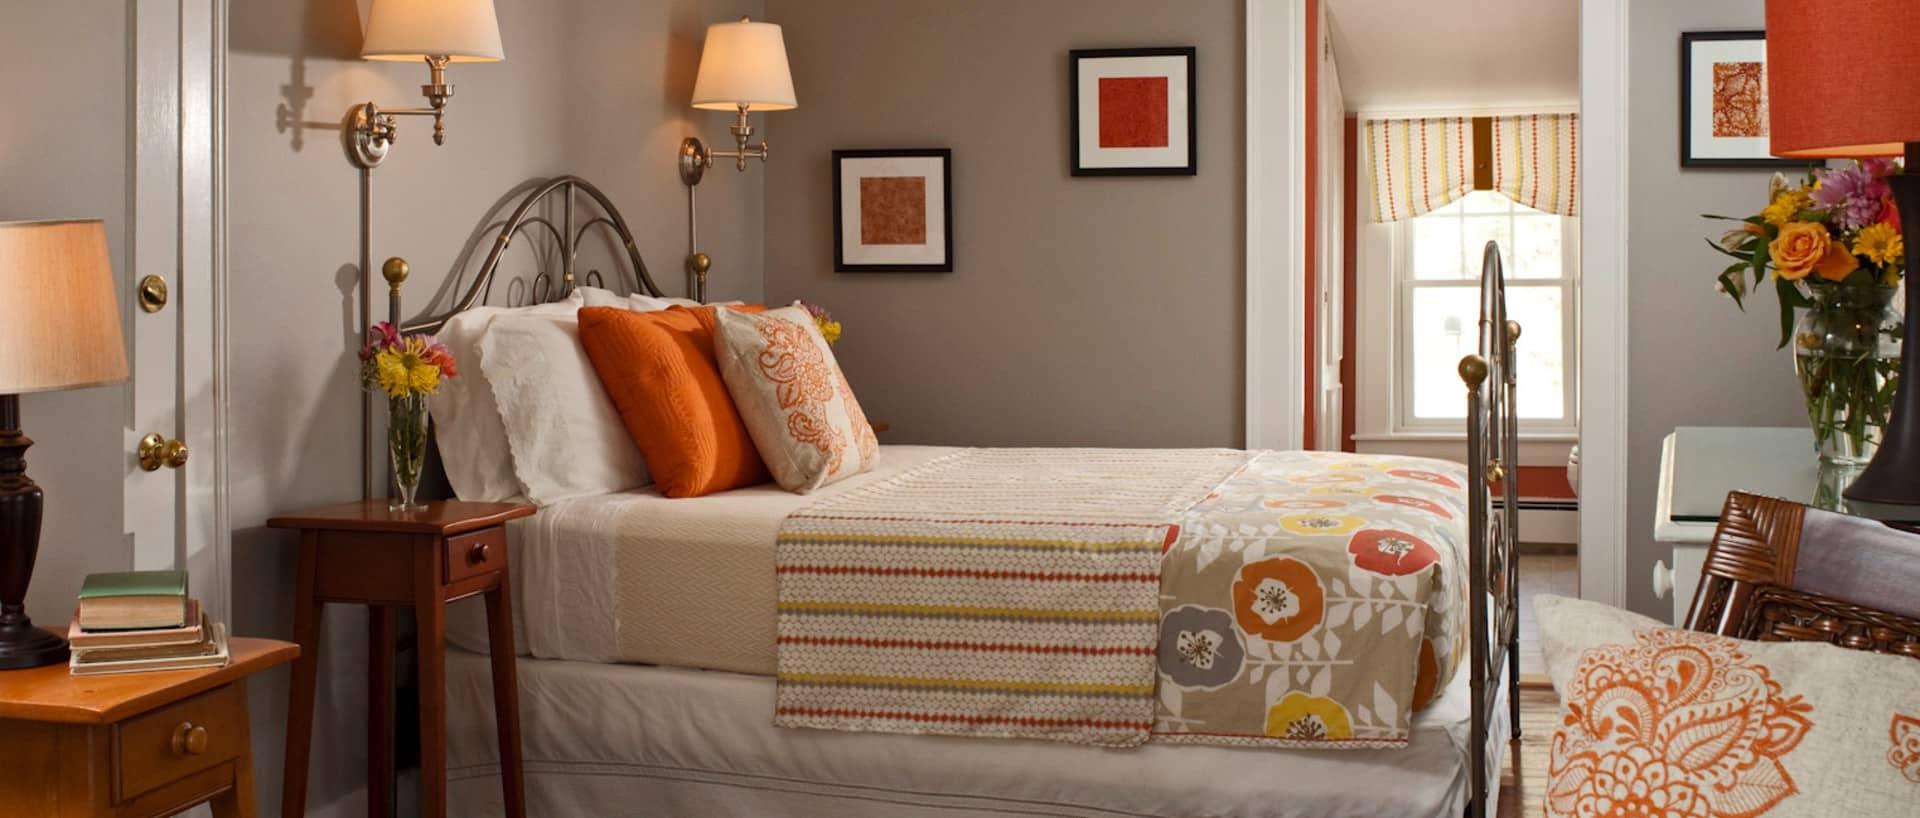 beige striped bedspread with flowers